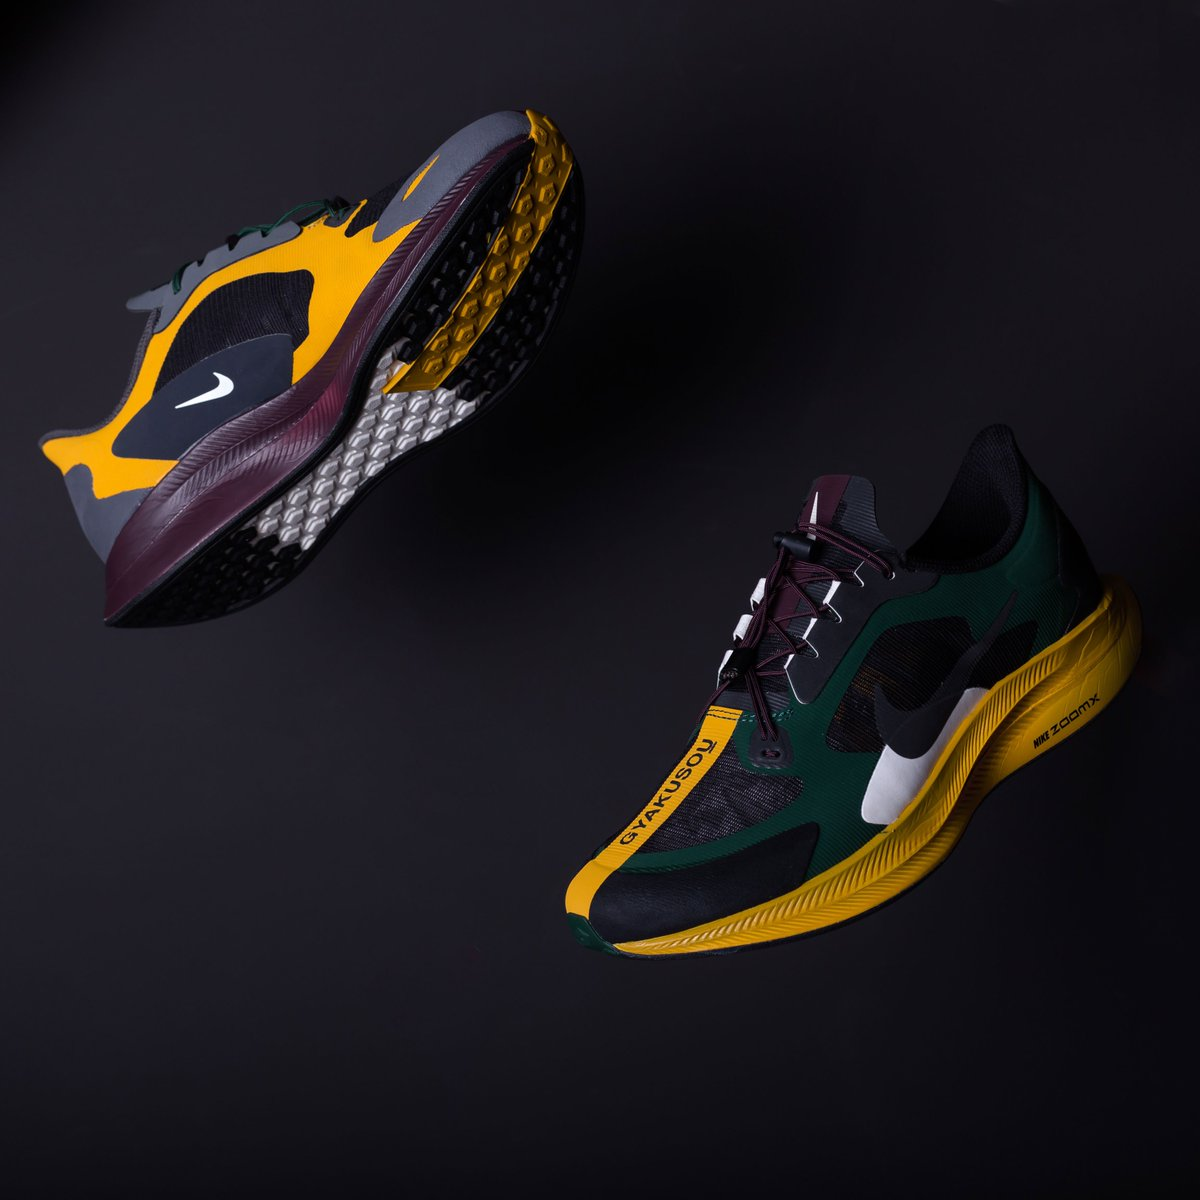 5f30d8509f33 Nike Zoom Pegasus 35 Turbo Gyakusou is here now  http   ow.ly ItzV30nSbMg   nike  gyakusou  footdistrictpic.twitter.com P3vTGxyxIg